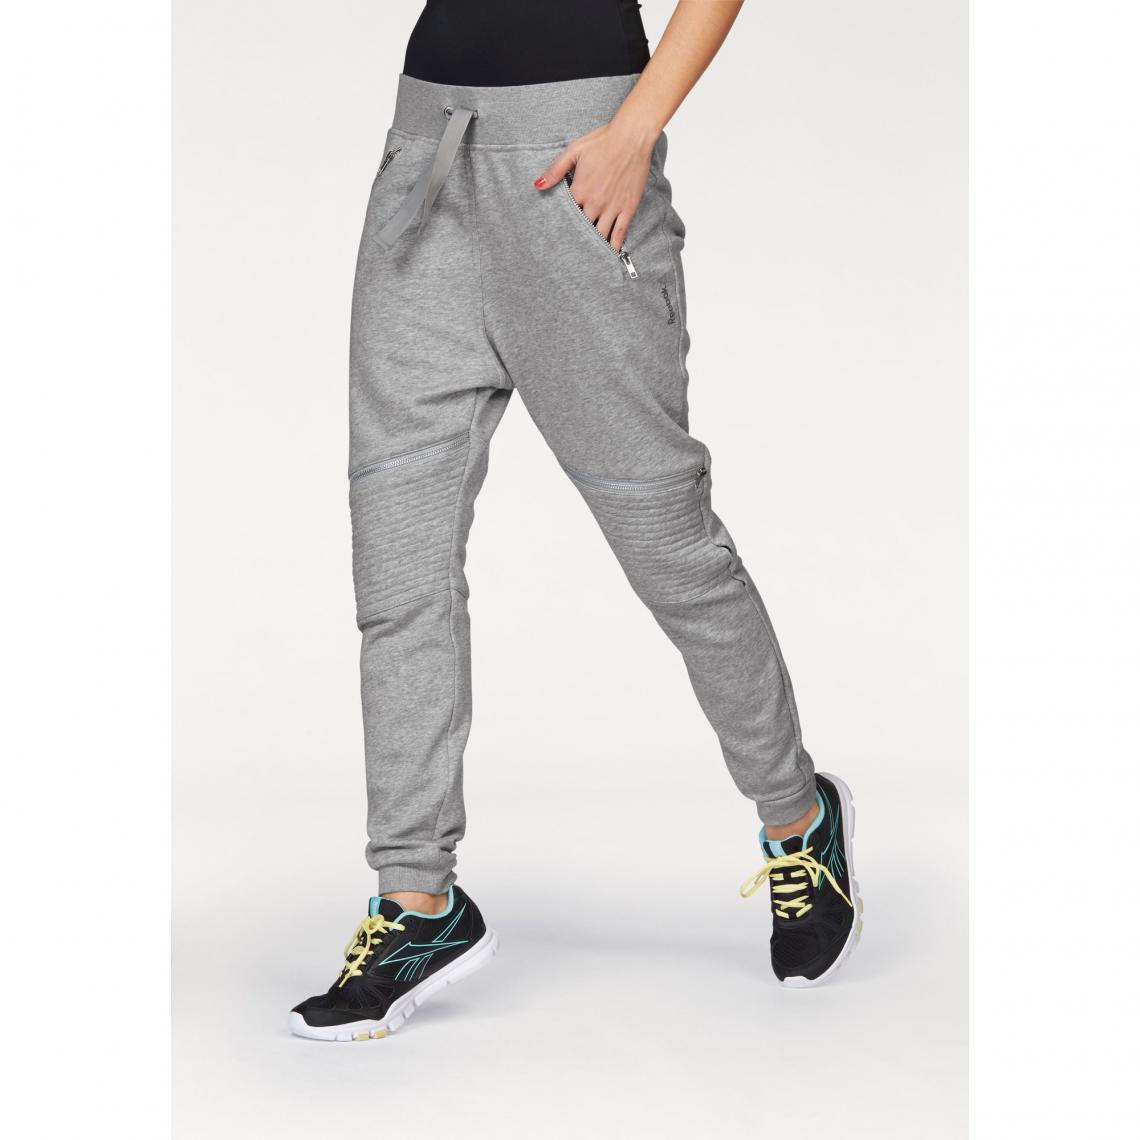 Pantalon de jogging sport femme Reebok - Gris Reebok Femme c32ae75209d